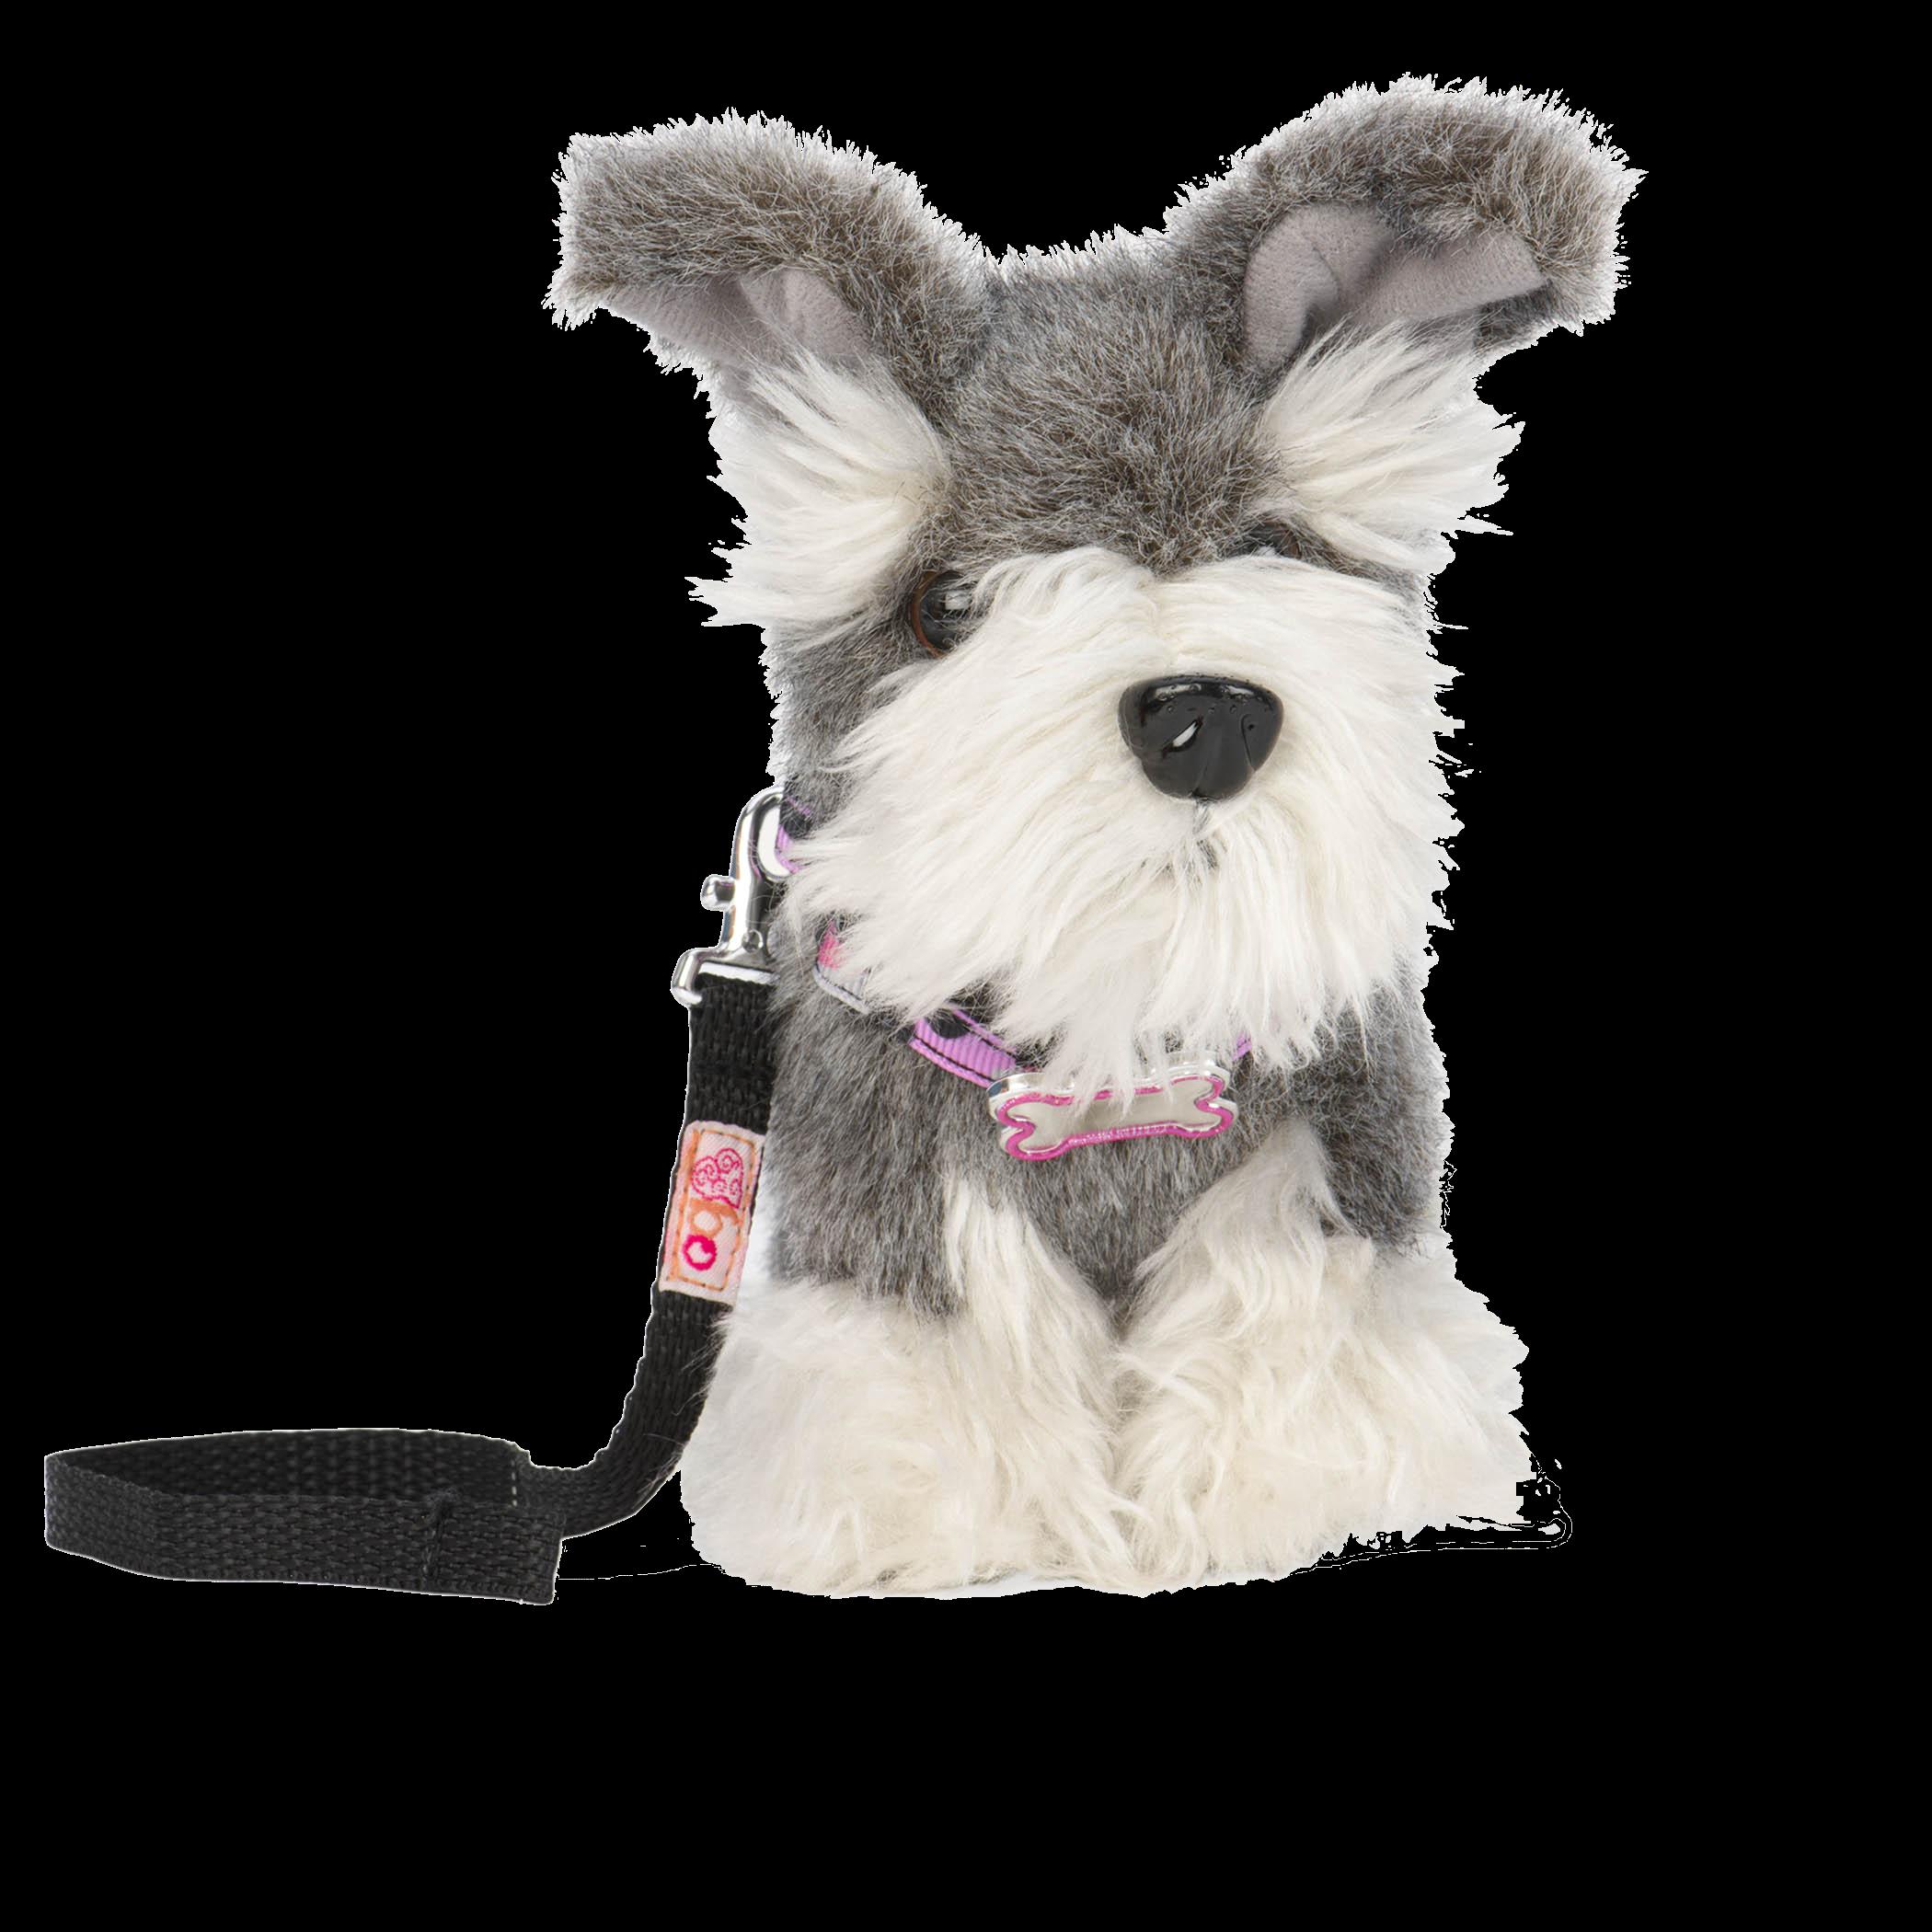 Schnauzer pup 6 inch plush puppy